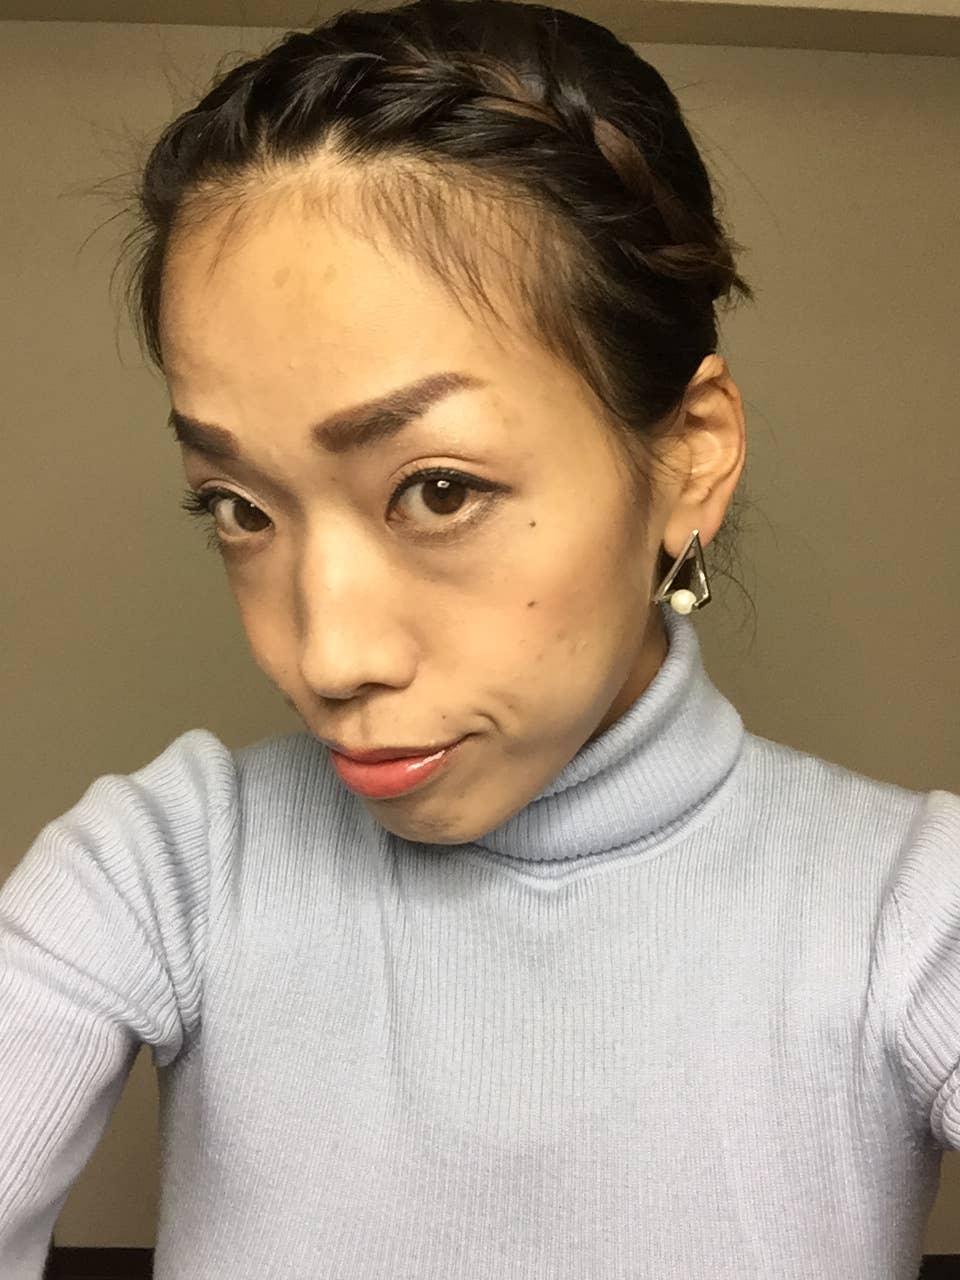 nanae nomoto